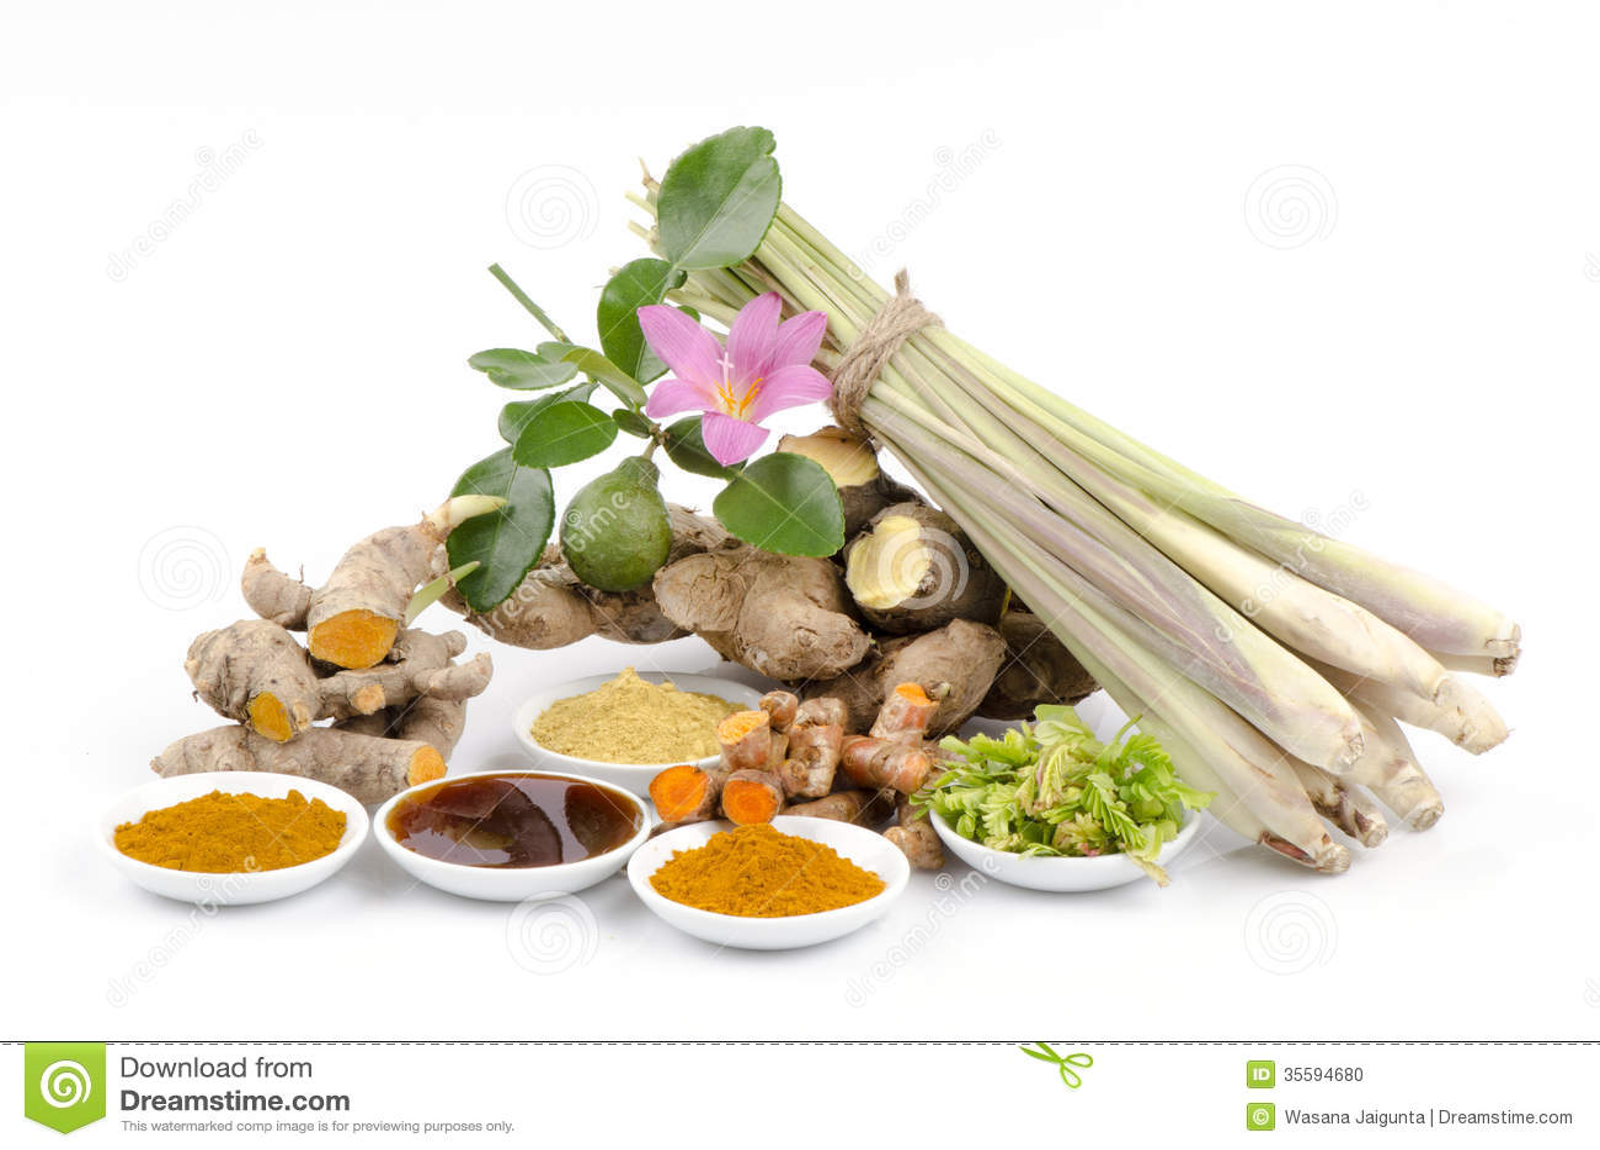 Thailand Herbal Body Scrub For Skin Treatment And Skin ...